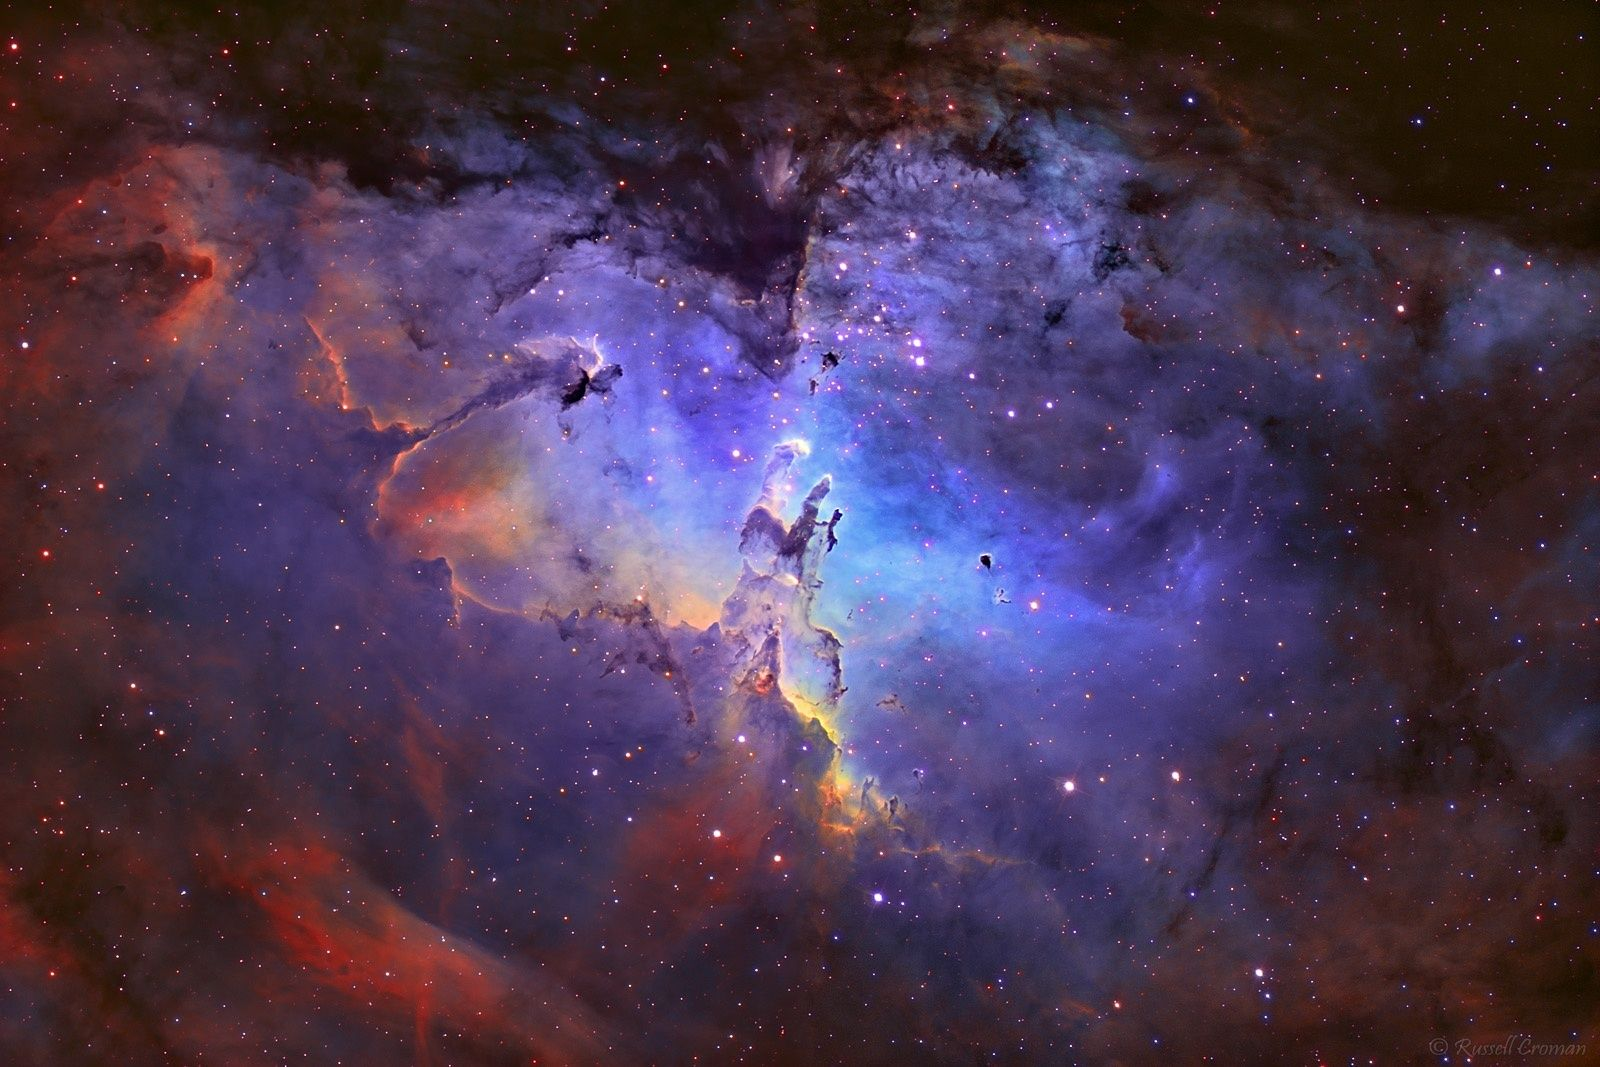 Pillars Of Creation Wallpaper Hd: Eagle Nebula's Pillars Of Creation